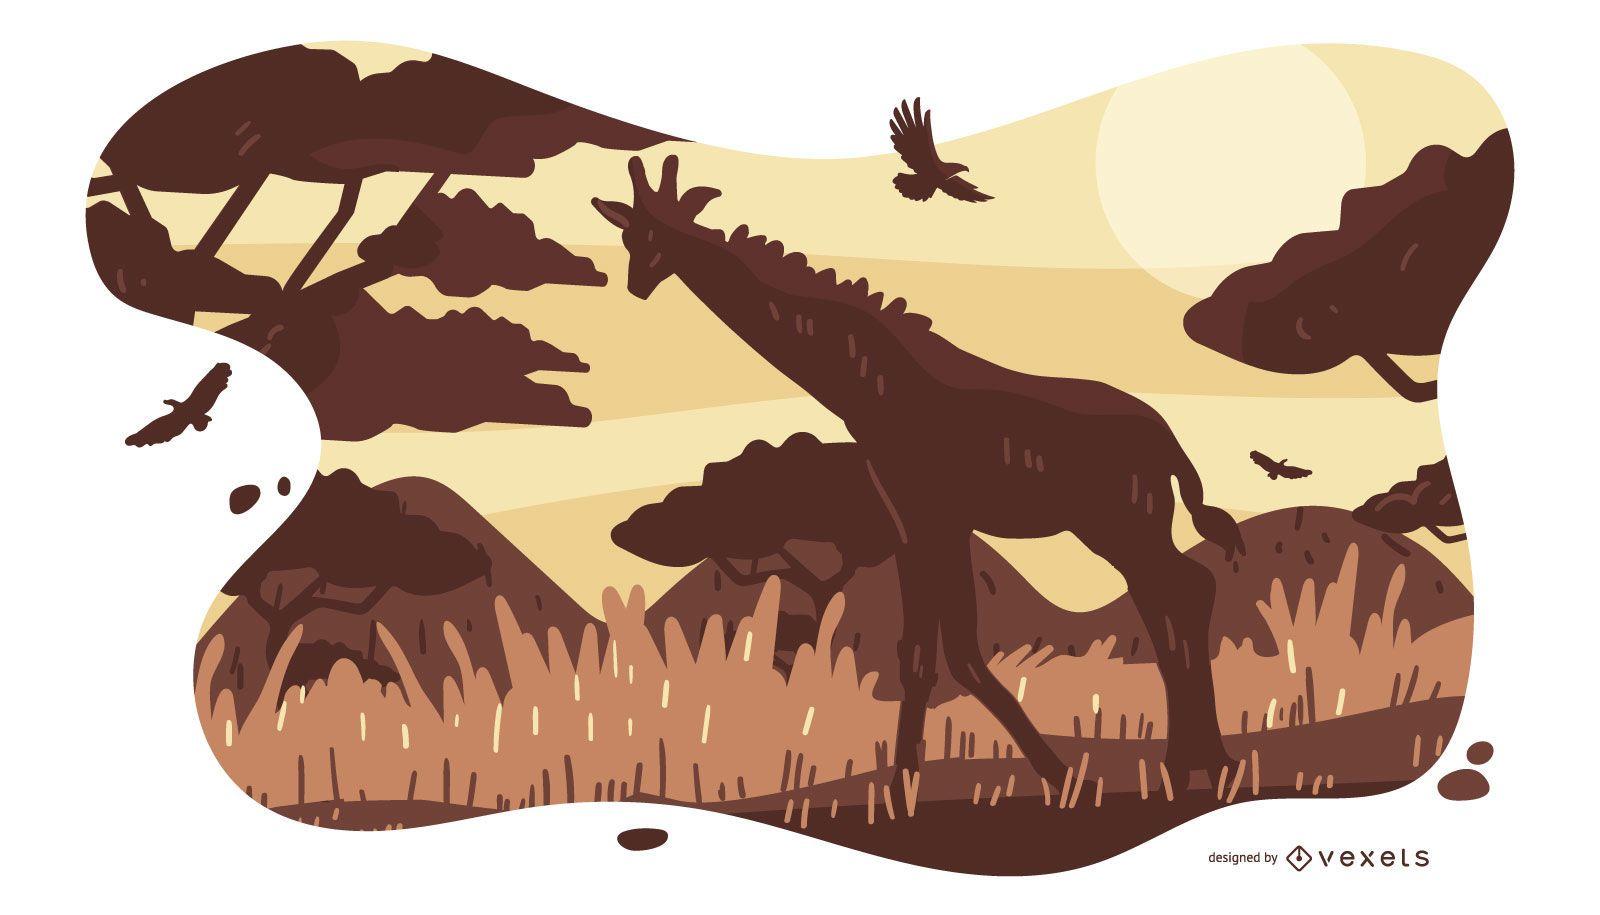 Safari Animal Africa Composition Design